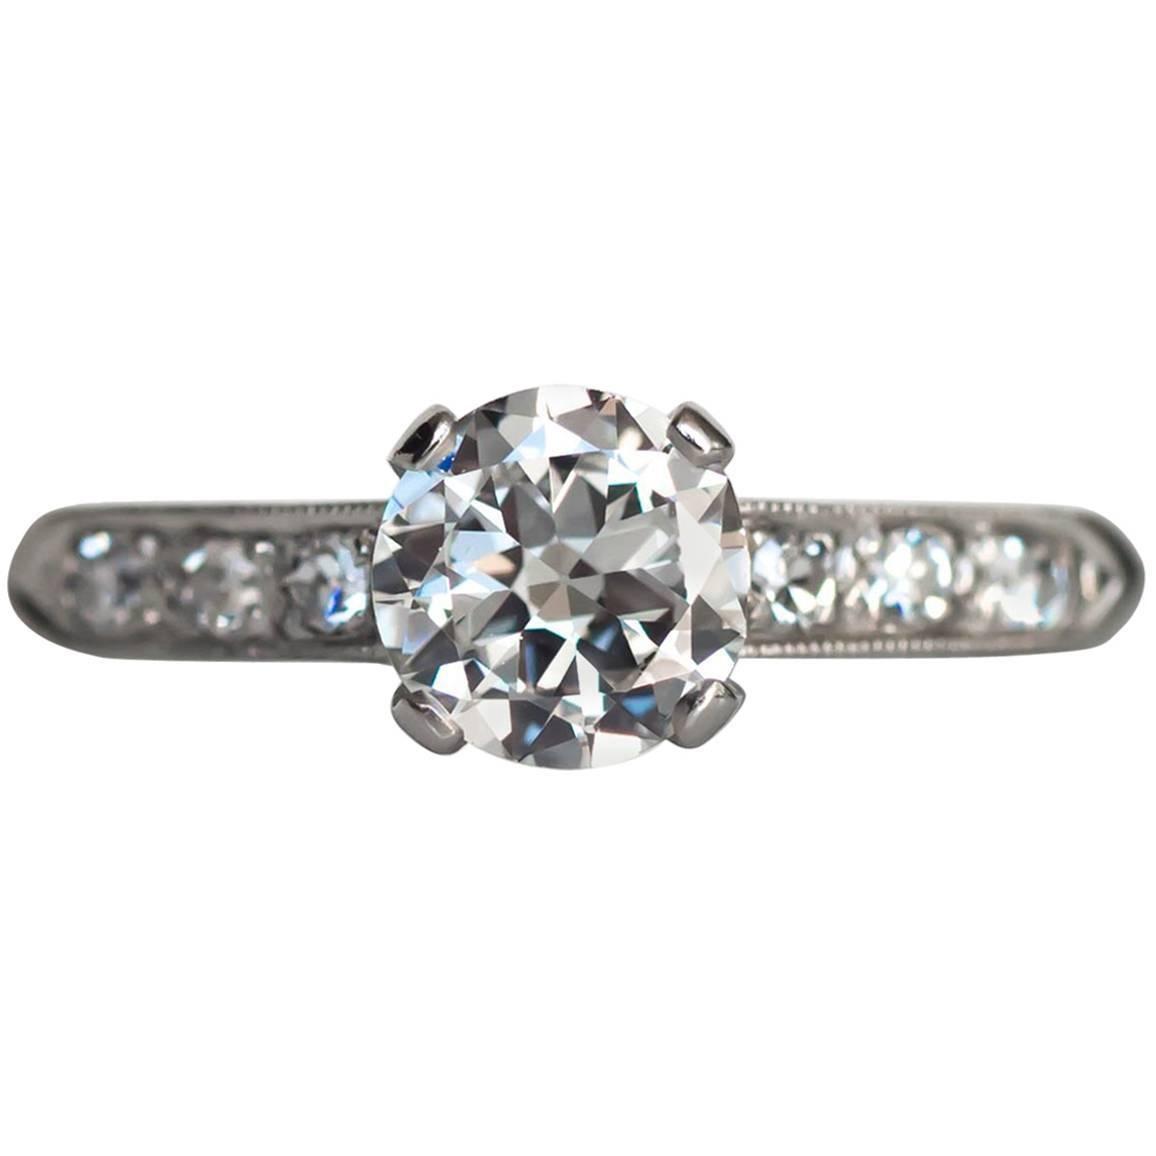 1940s Late Art Deco .65 Carat Diamond White Gold Engagement Ring